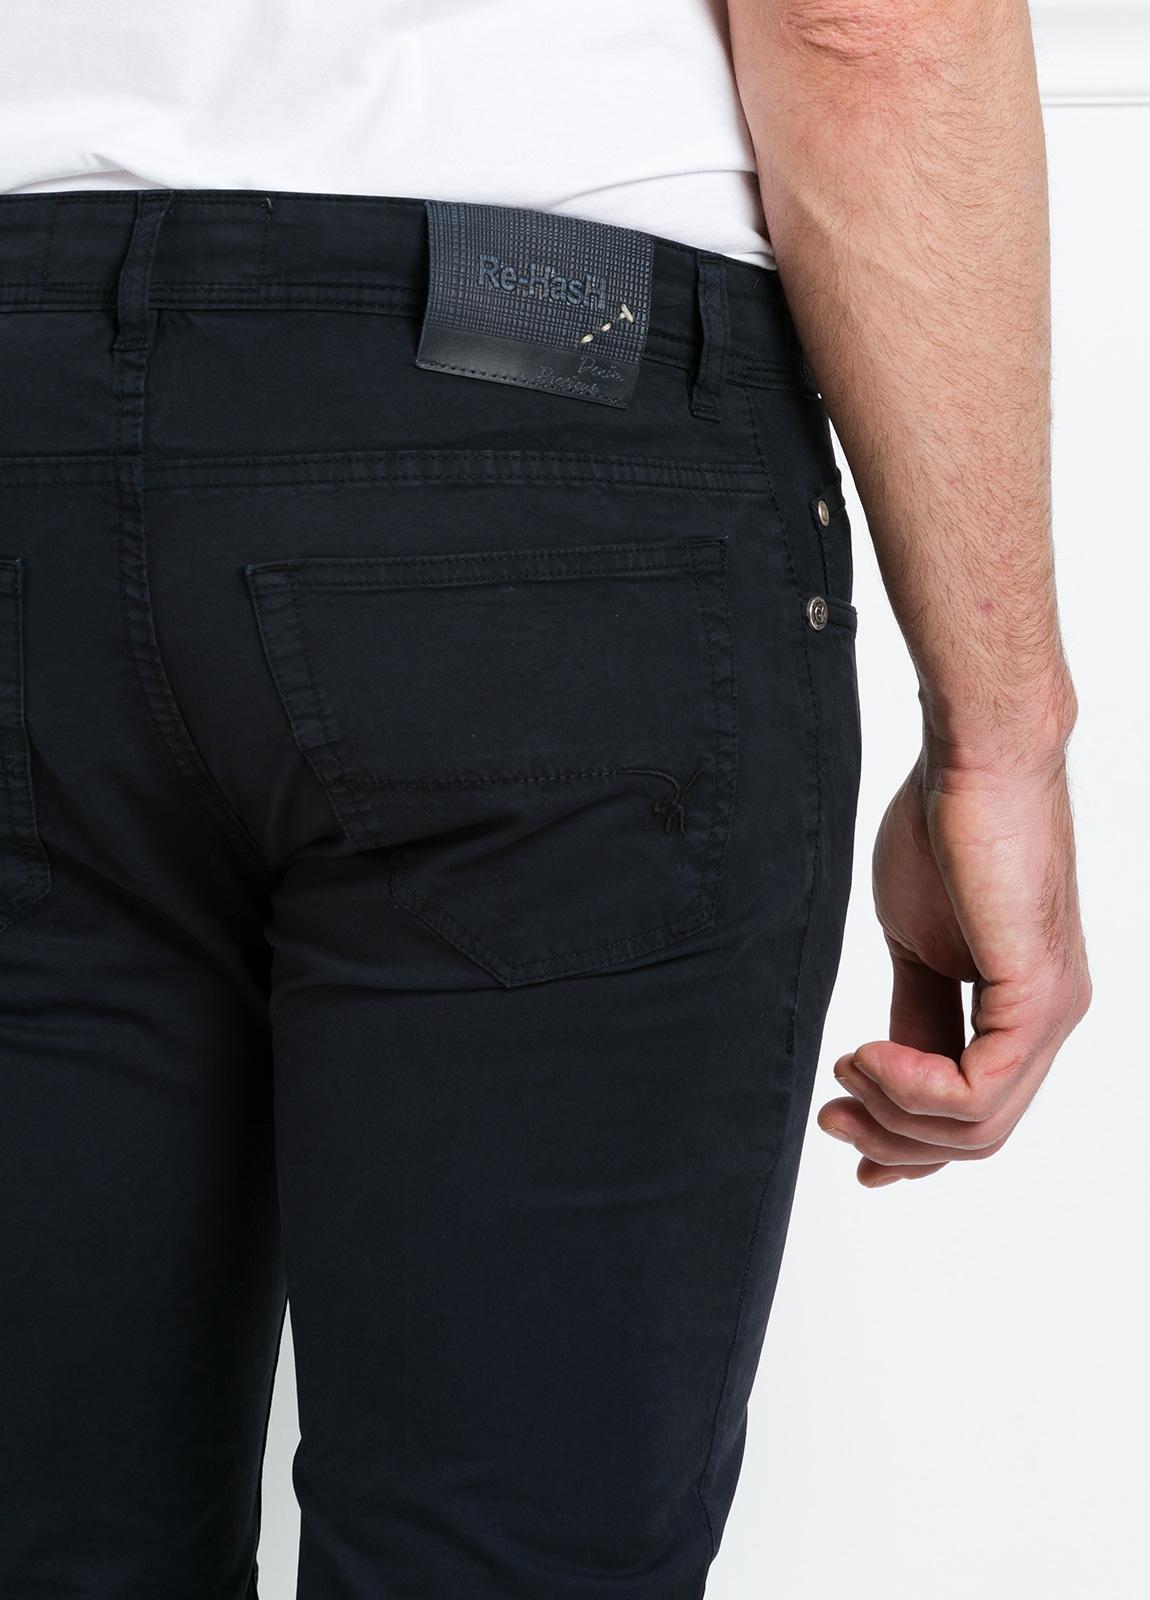 Pantalón sport regular fit modelo POLLOCK P 053 color azul marino. 96% Algodón gabardina 4% Lycra. - Ítem2